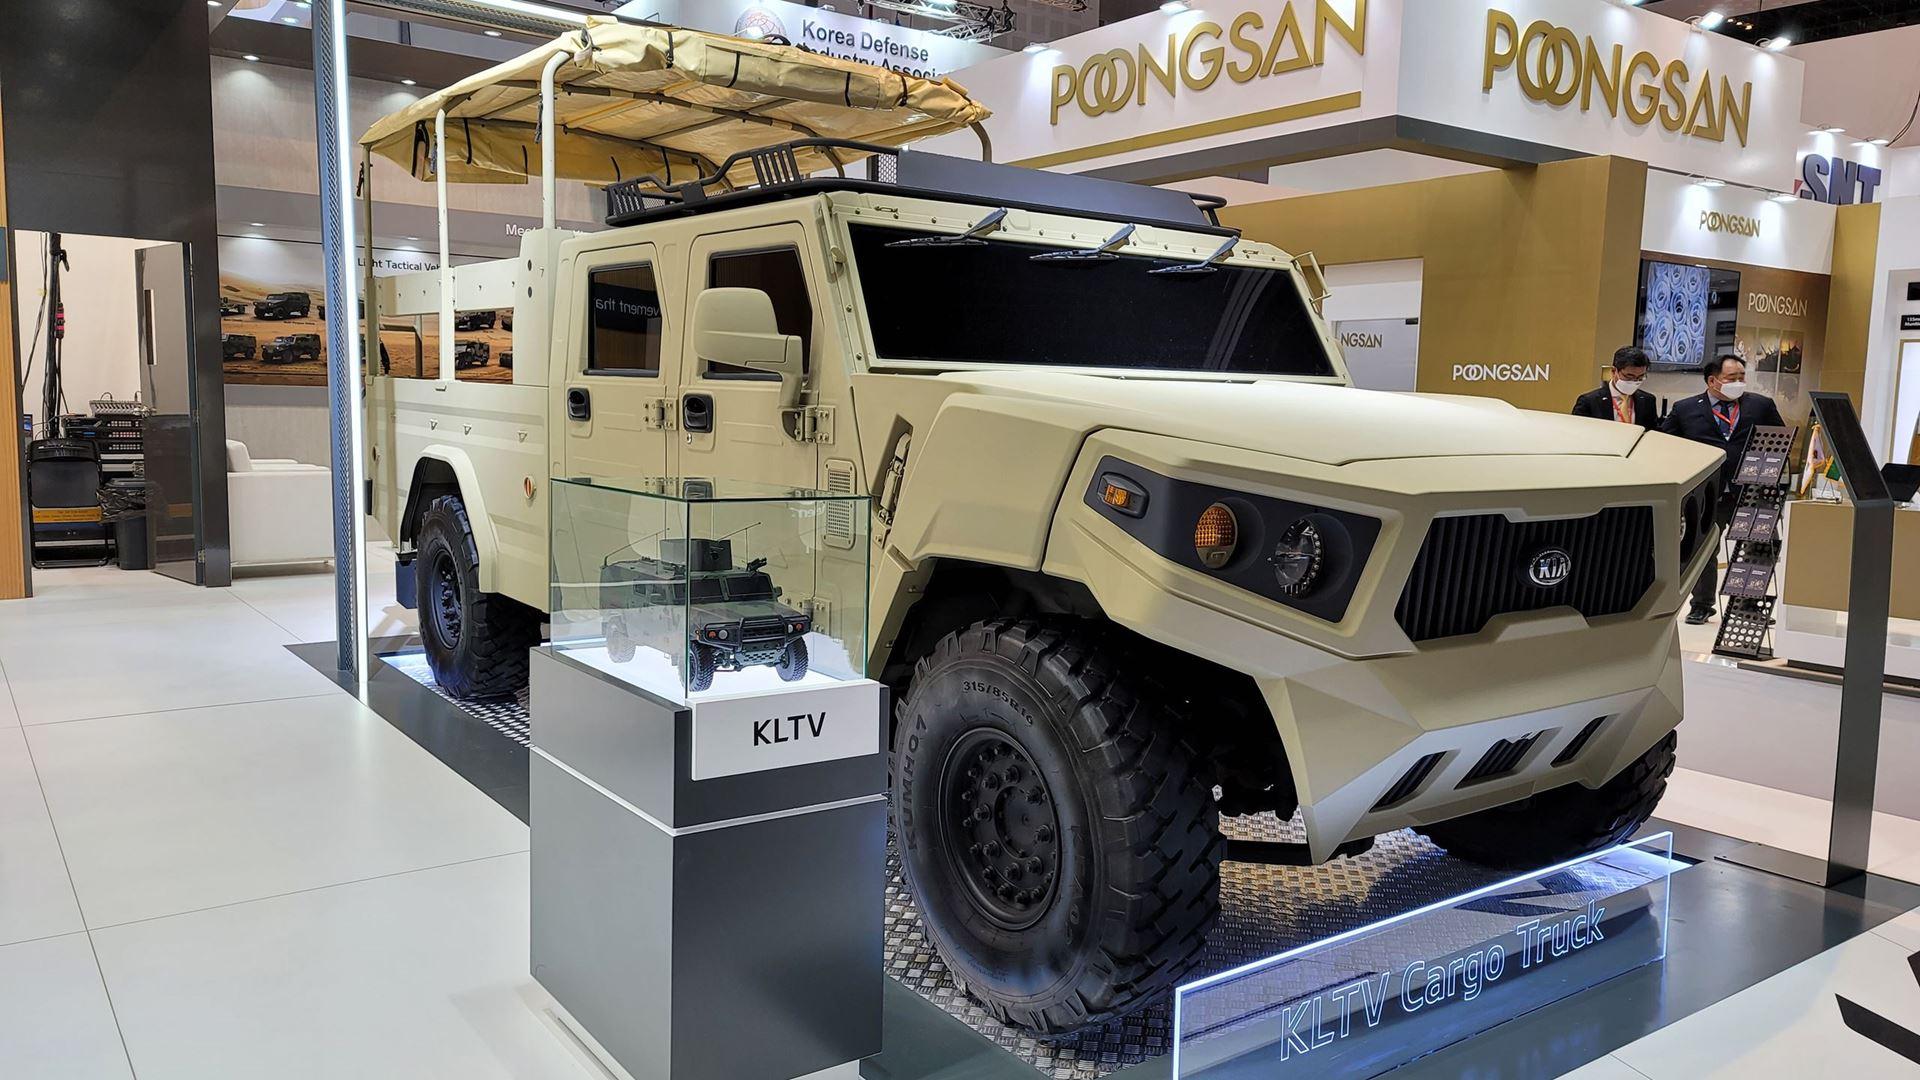 Kia showcases new defense vehicle technologies at IDEX 2021 defense exhibition - Image 3